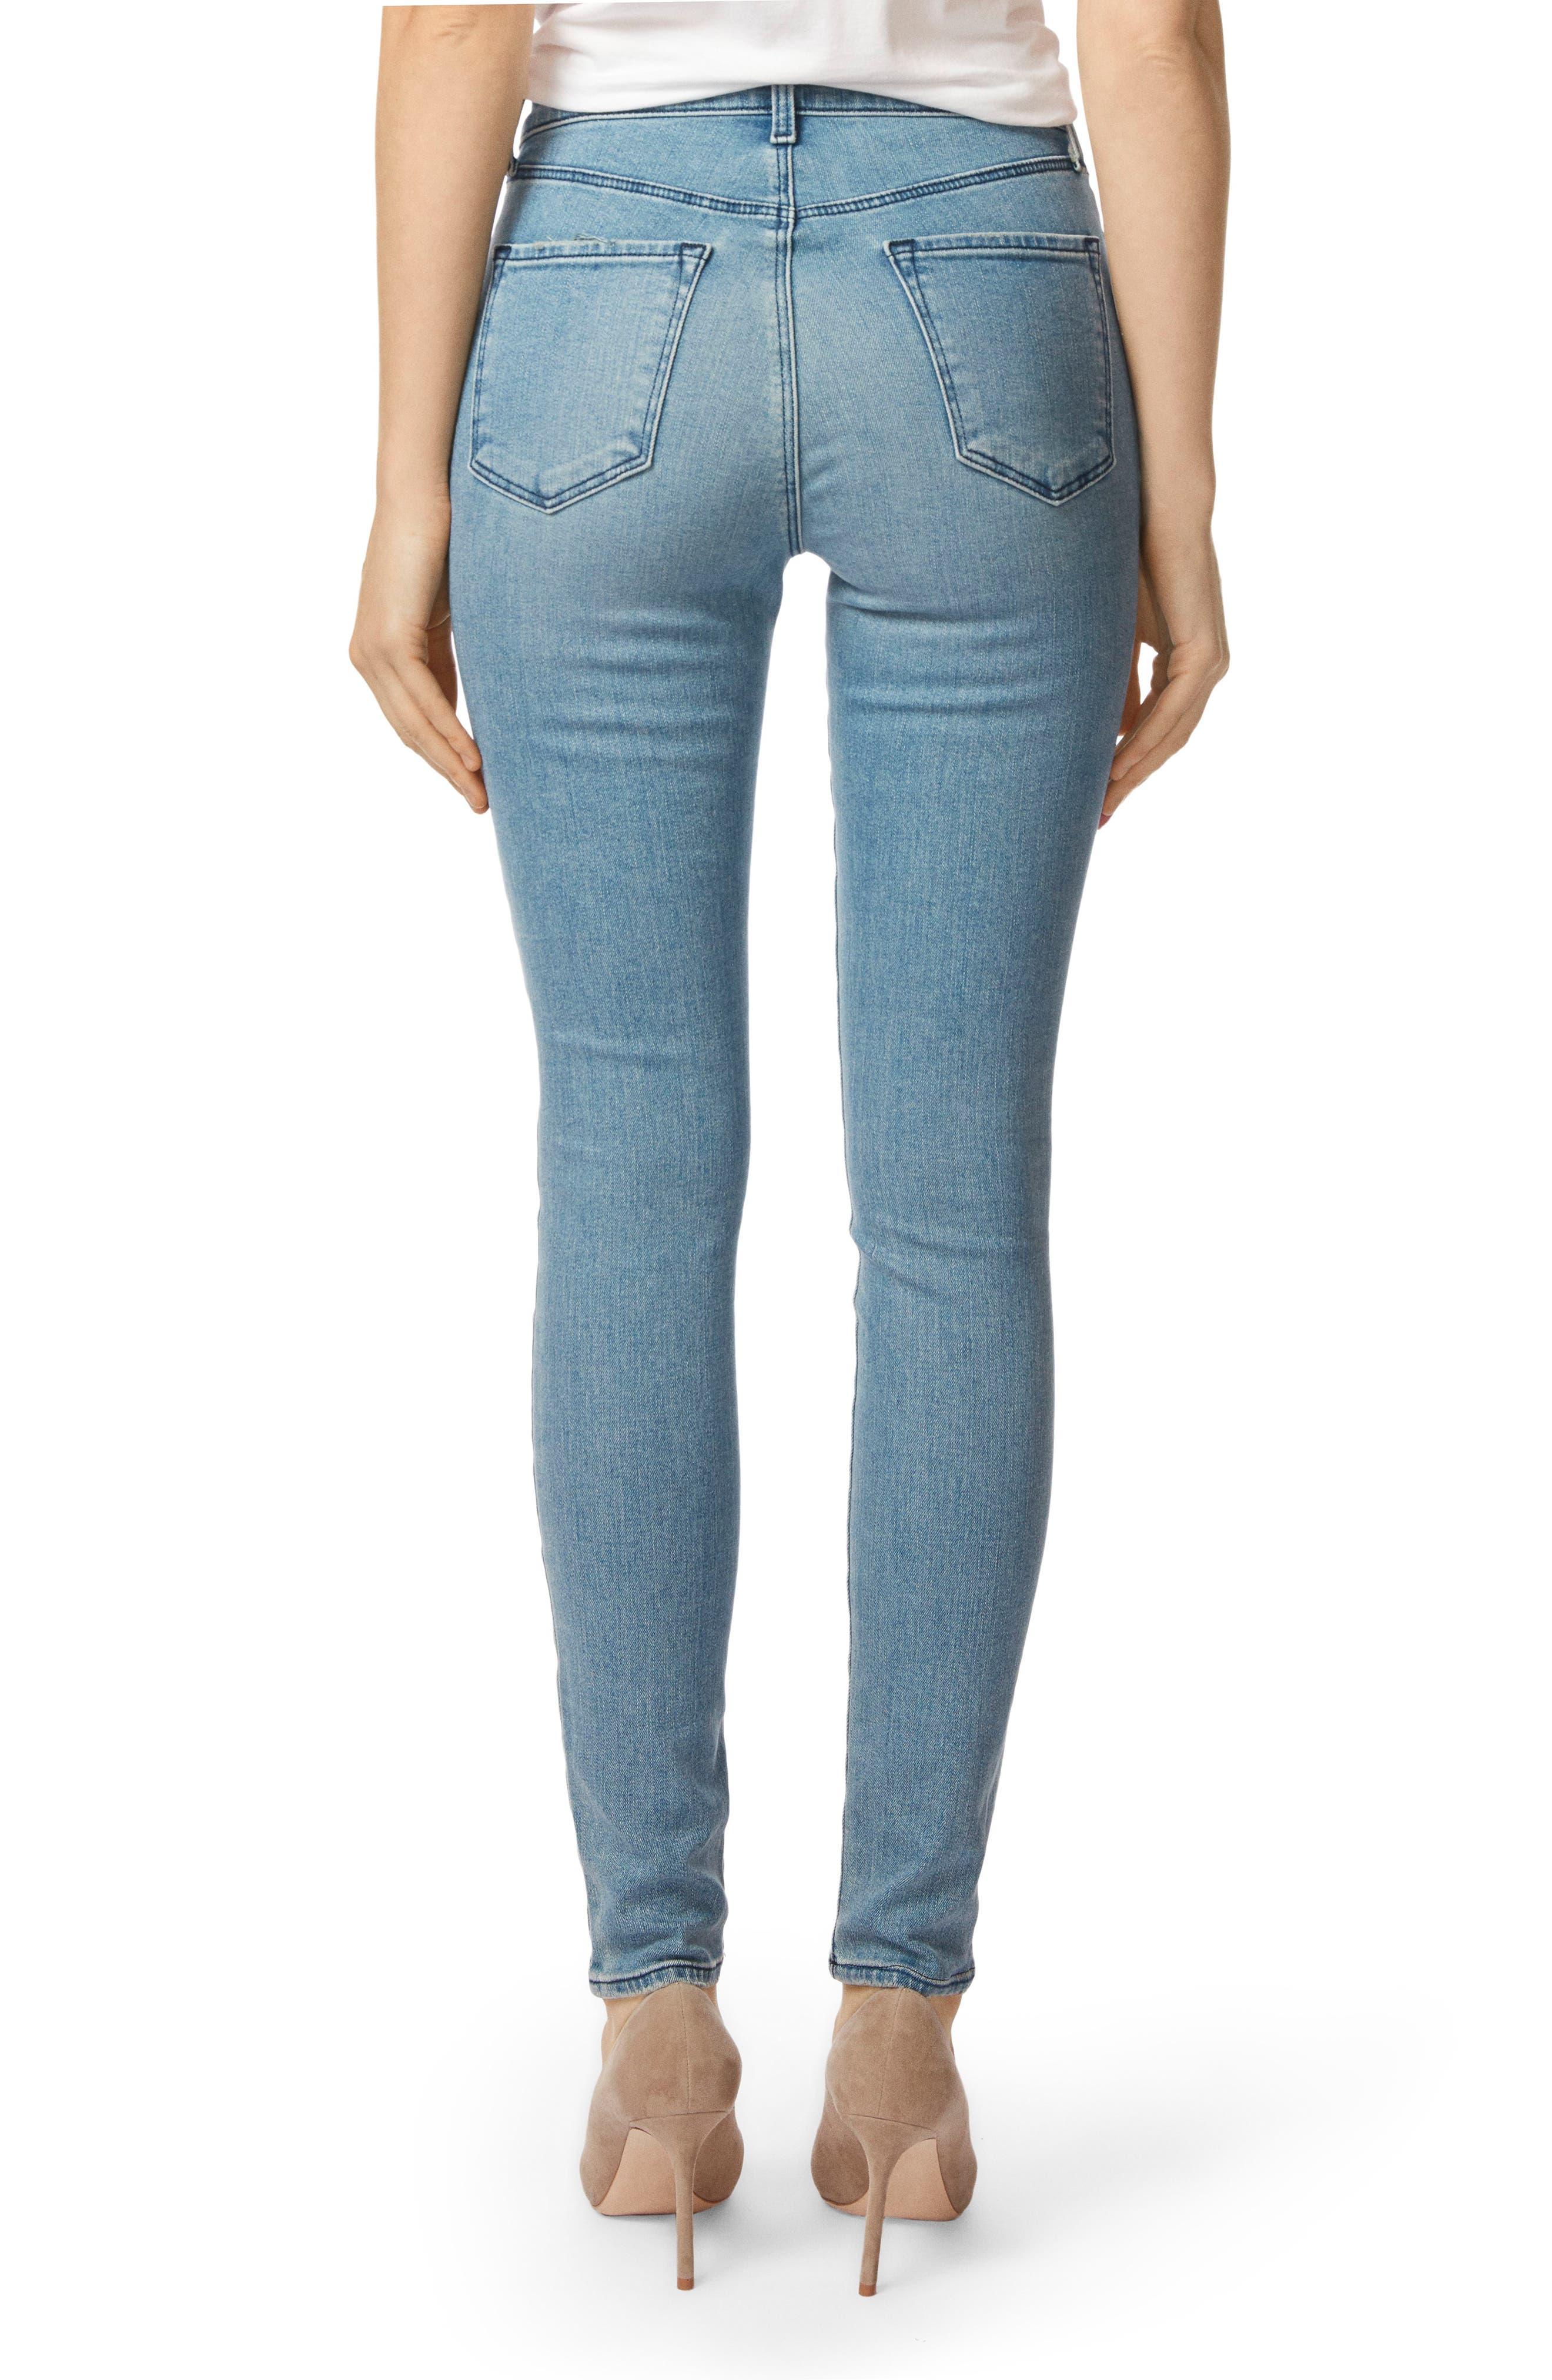 J BRAND, Maria High Waist Skinny Jeans, Alternate thumbnail 2, color, 407